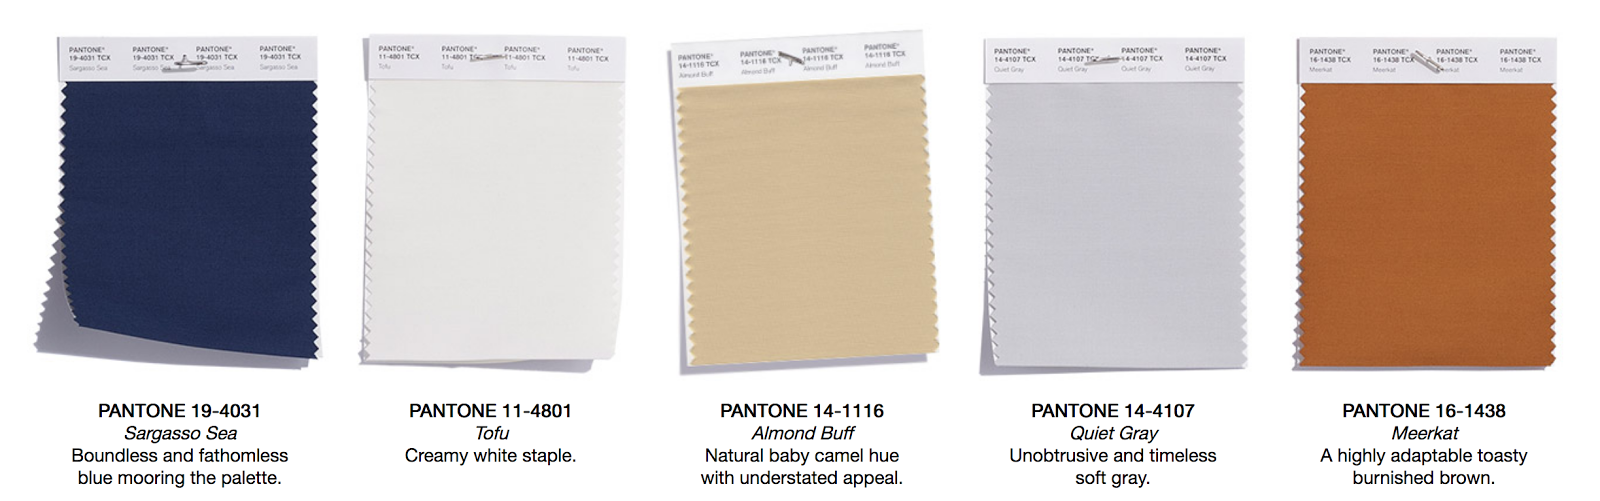 Pantone Colour Trends A W 2018 2019 Kukka